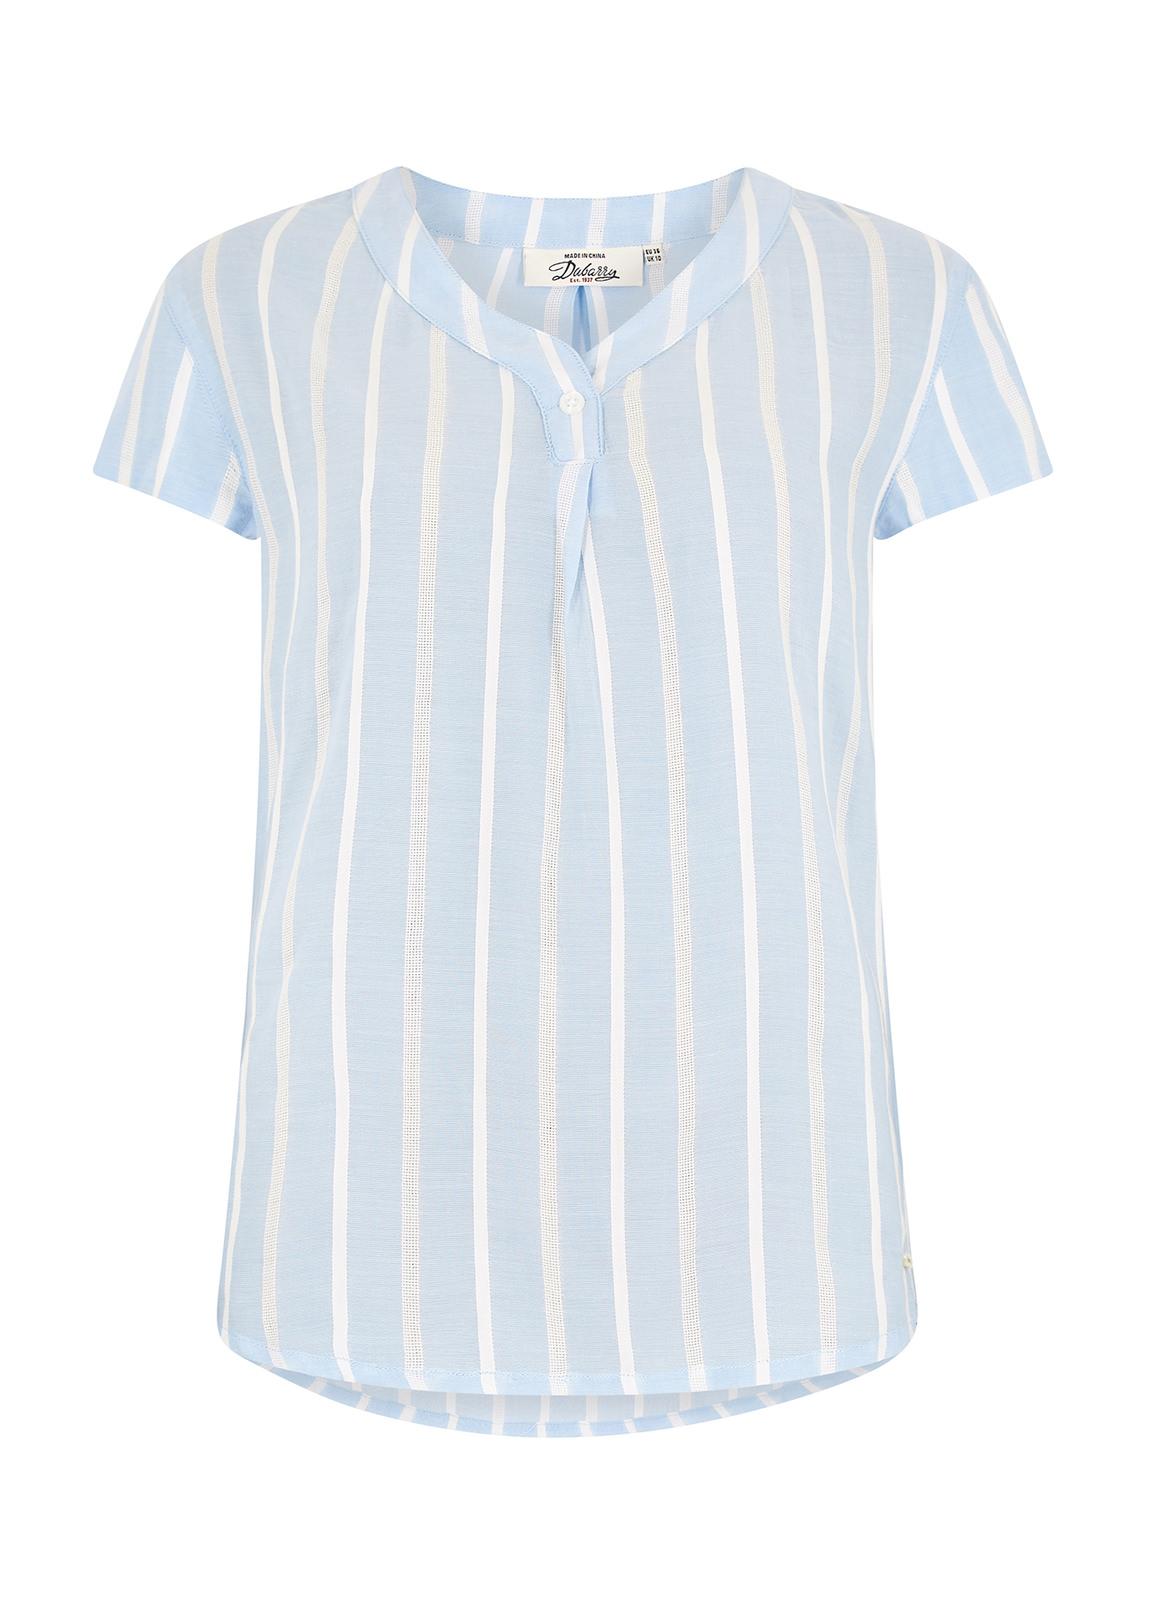 Dubarry_Gardenia Shirt - Pale Blue_Image_2